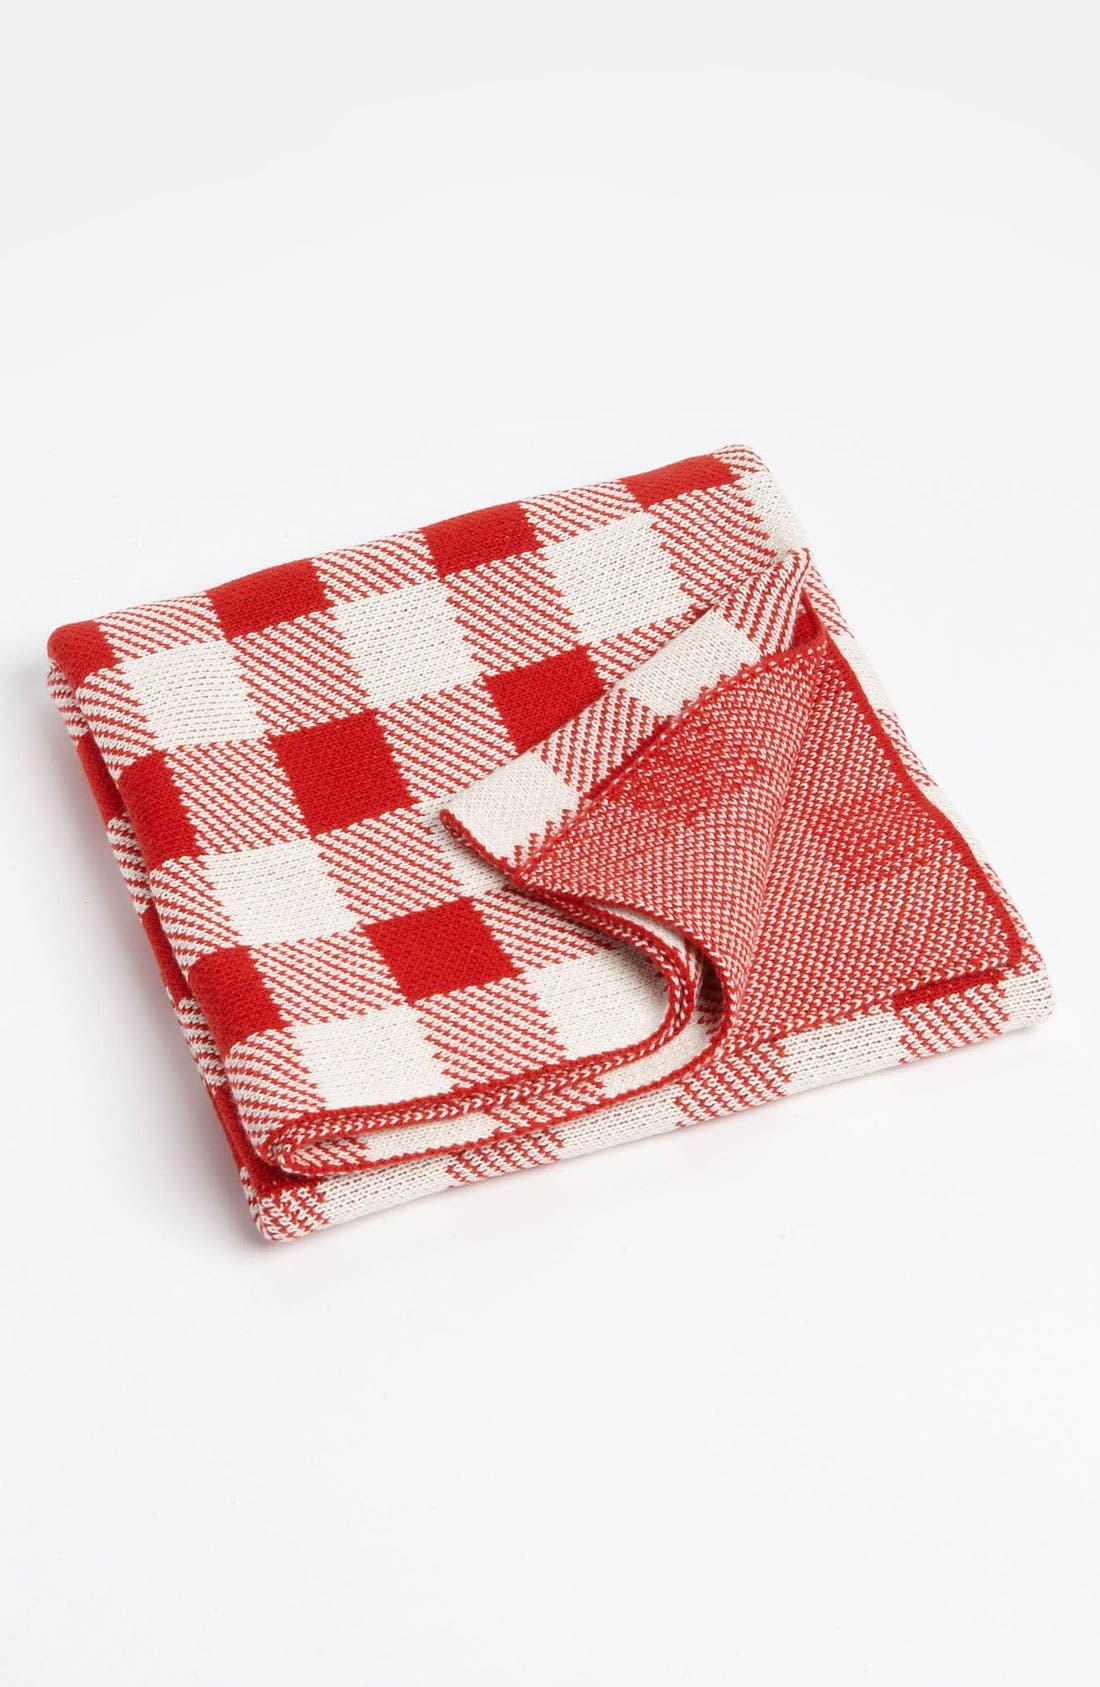 Main Image - Nordstrom Baby Gingham Blanket